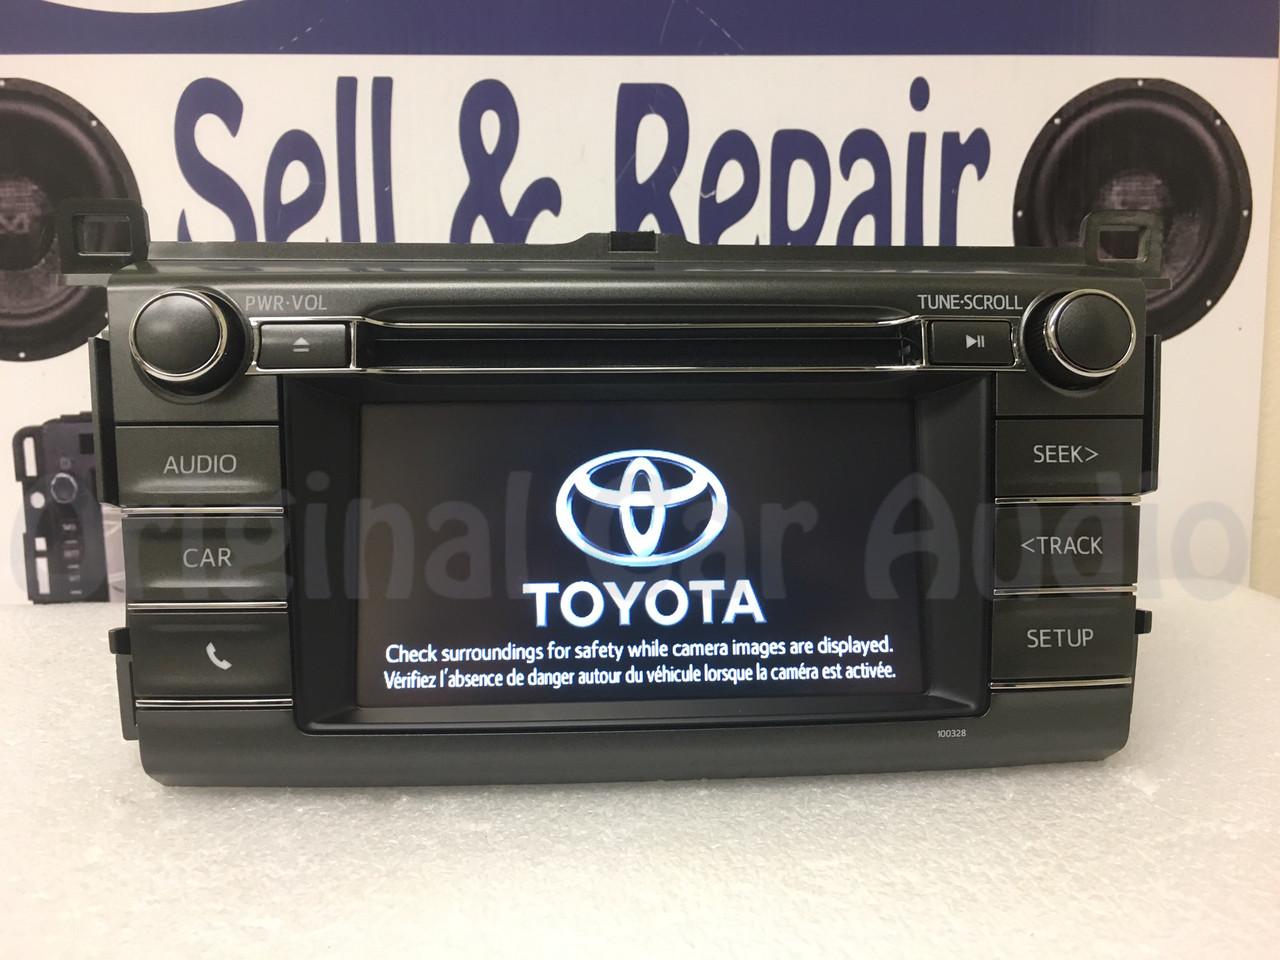 2014 2015 Toyota Rav4 AM FM Radio OEM Touchscreen Bluetooth Unit 1000327